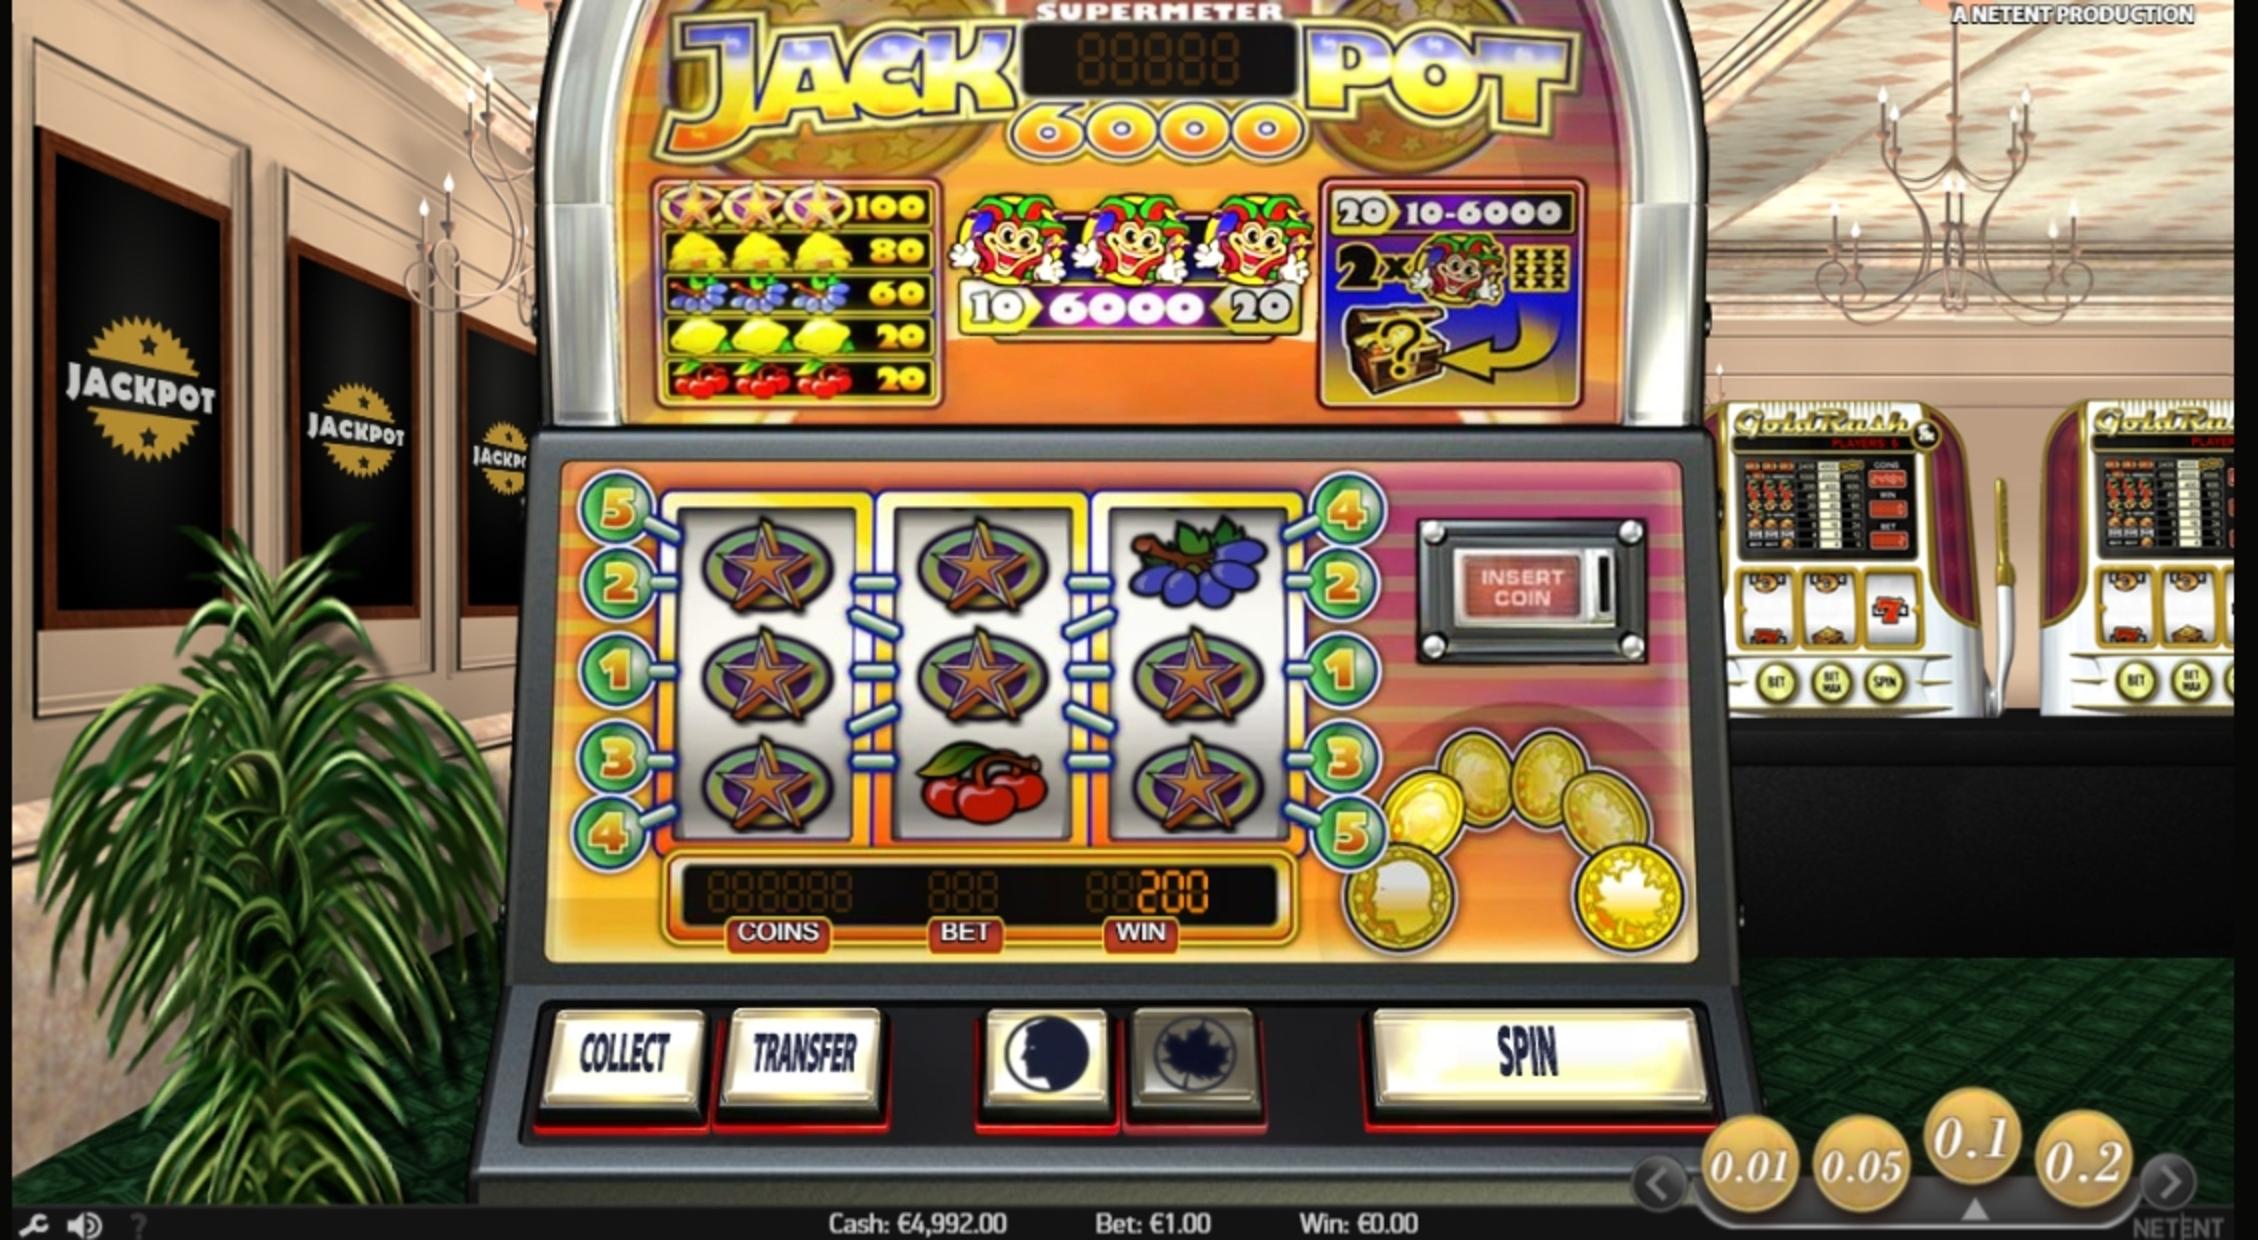 NetEnt Online Casinos & Slot Machines